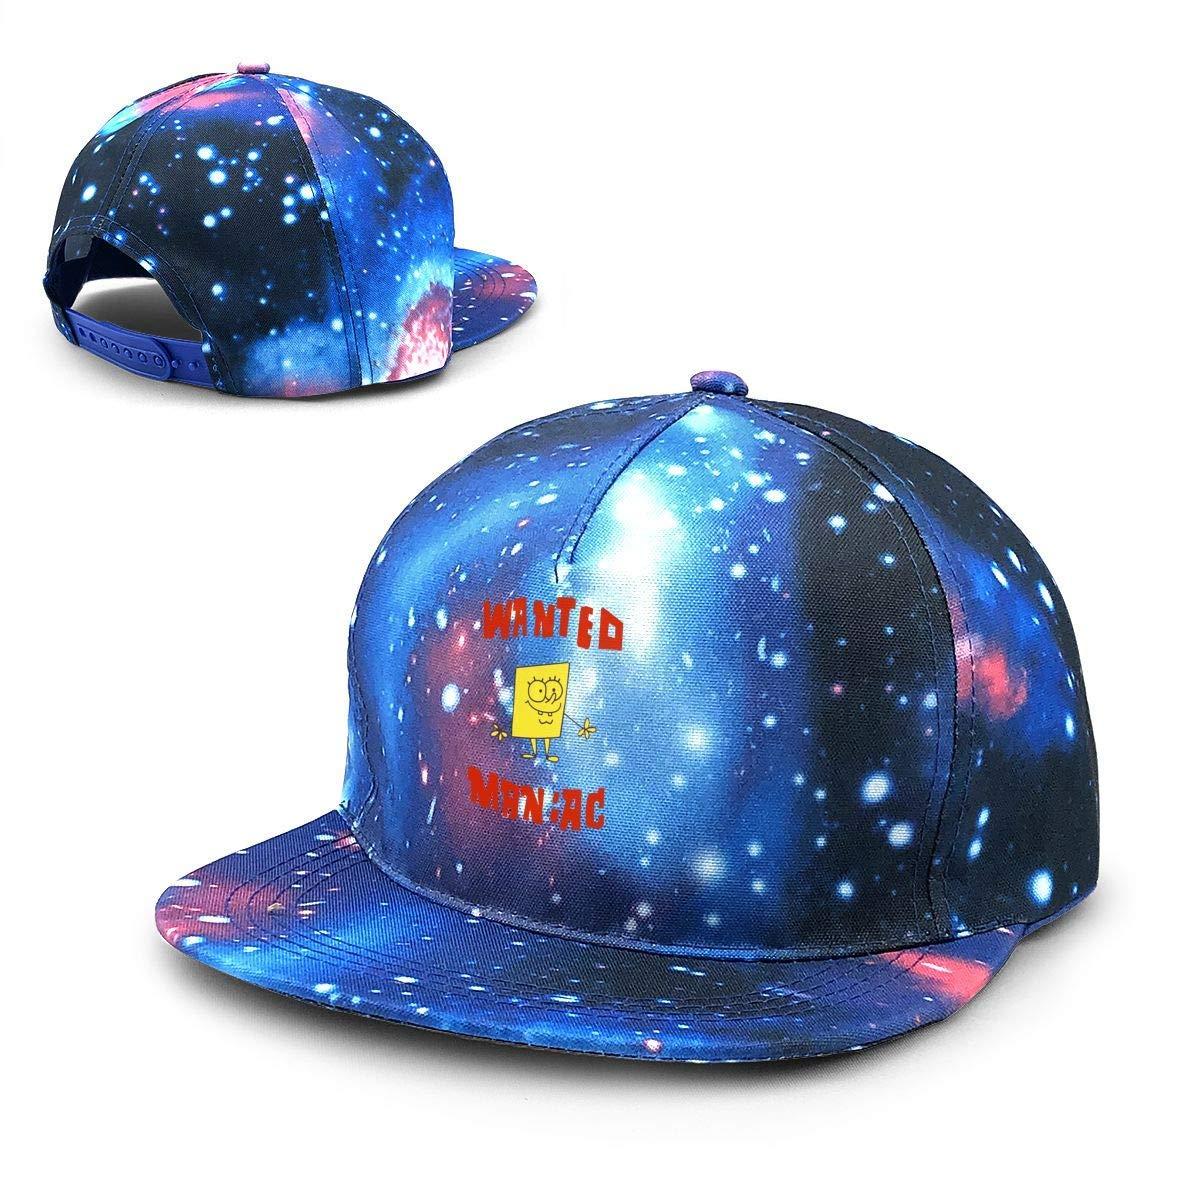 Rogerds Baseball Kappe f/ür Herren//Damen,Sternenhimmel M/ütze,Sternenhimmel Hut Spongebob Squarepants Baseball Hat Adjustable Sun Cap Hip Pop Hat